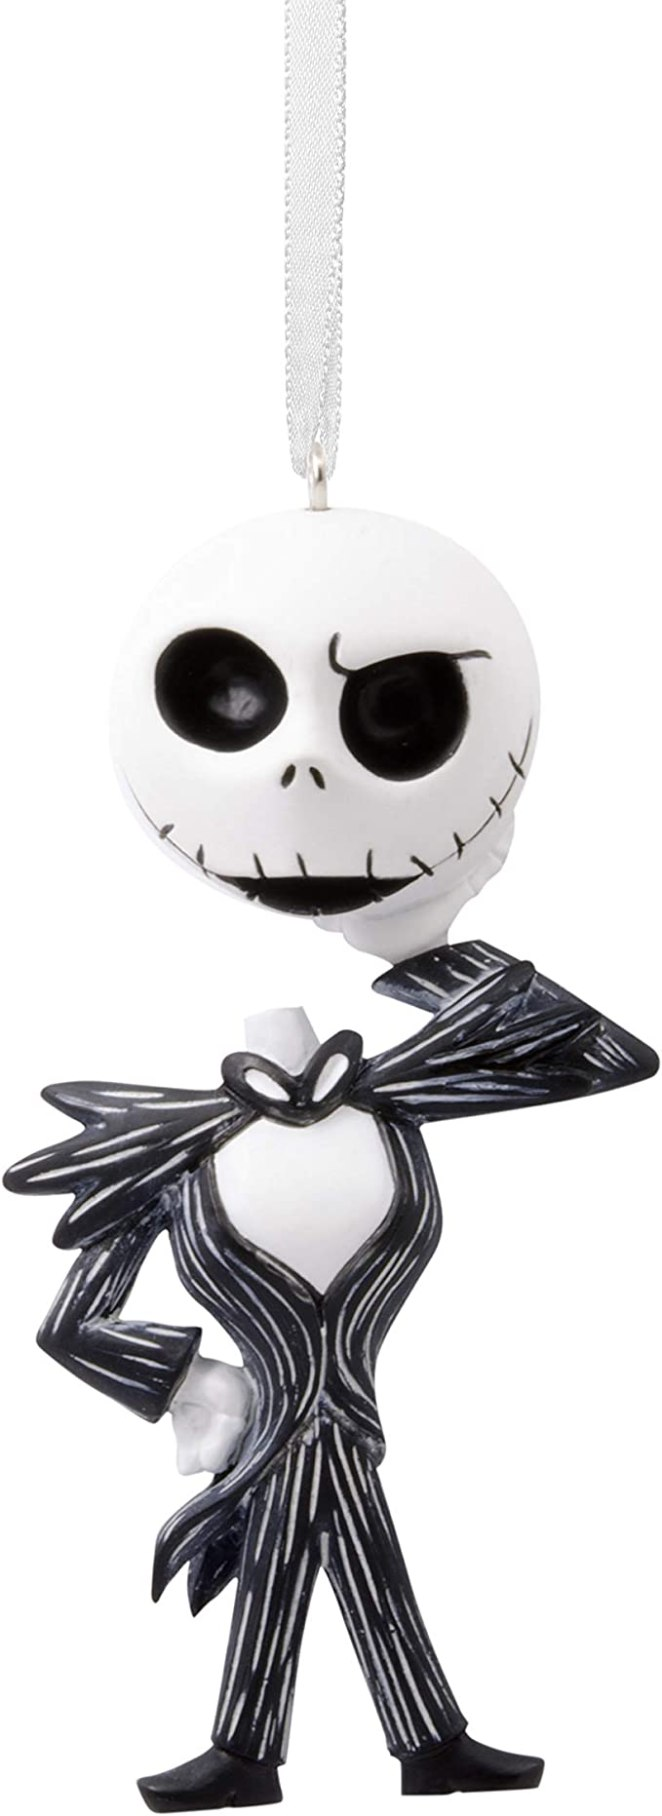 Hallmark Christmas Ornaments, The Nightmare Before Christmas Jack Skellington Ornament